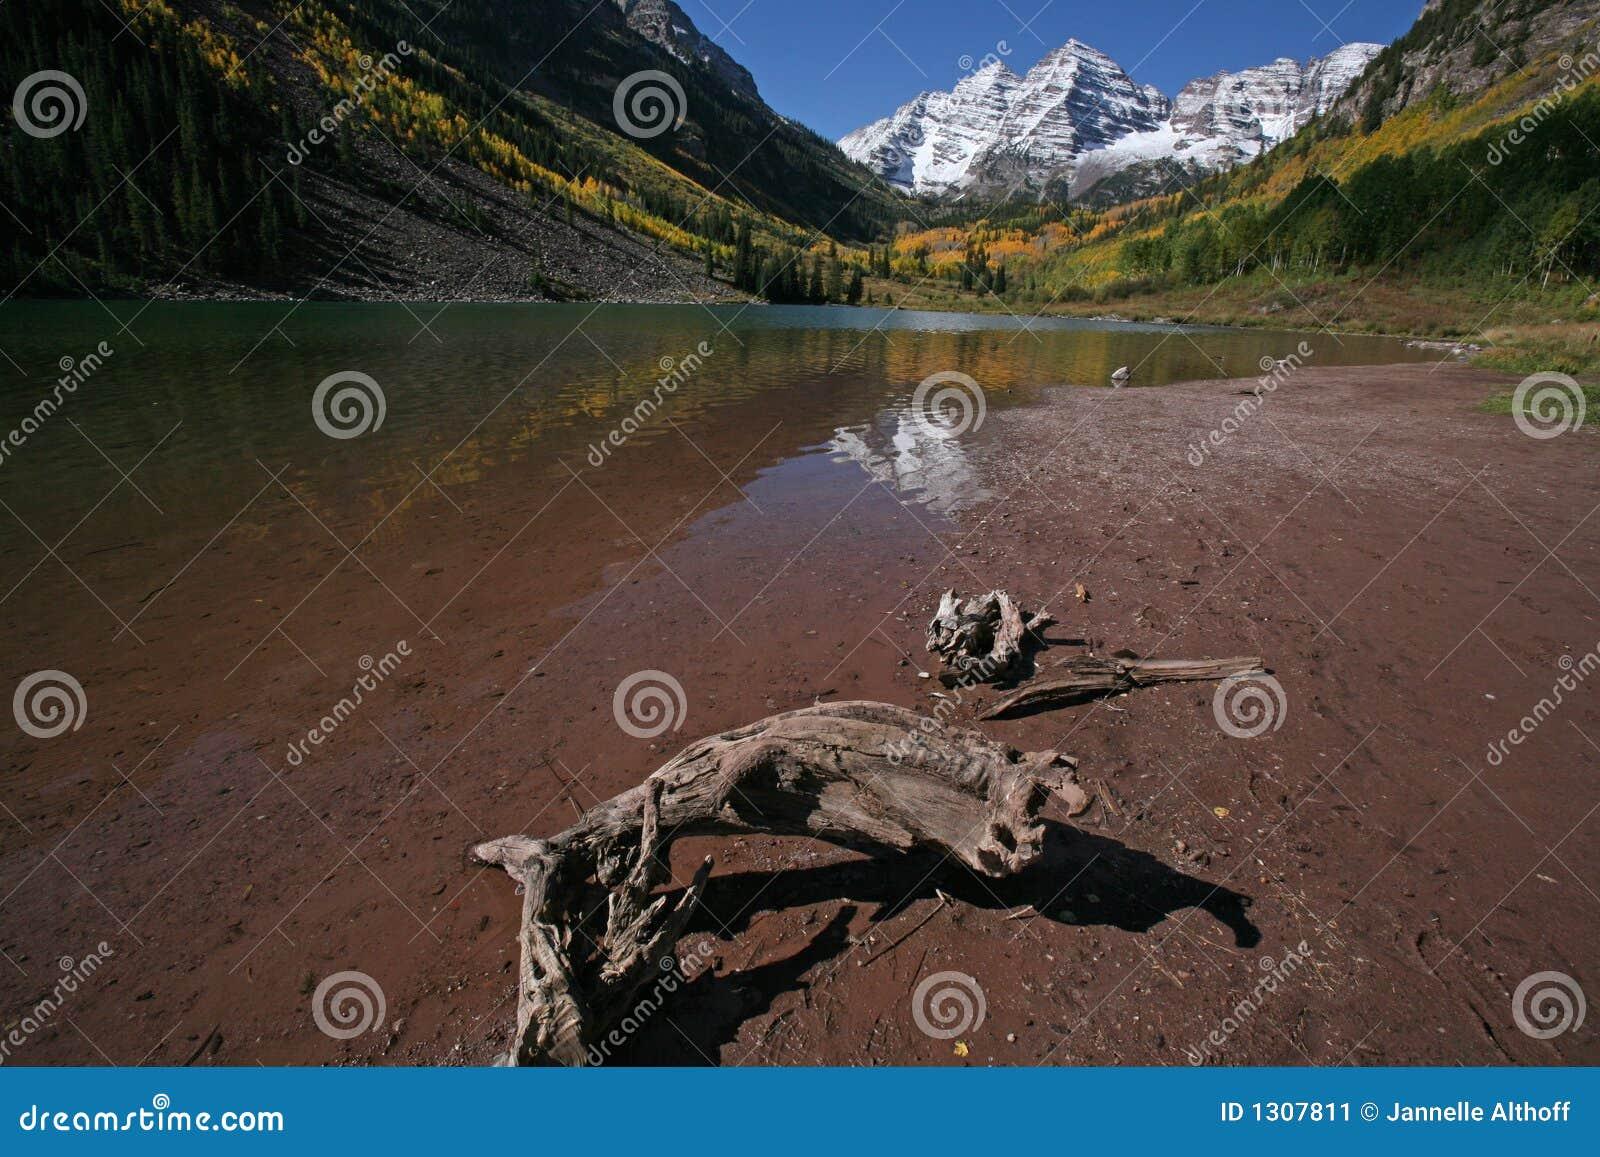 Download Walking along lake shore stock image. Image of clear, reflection - 1307811